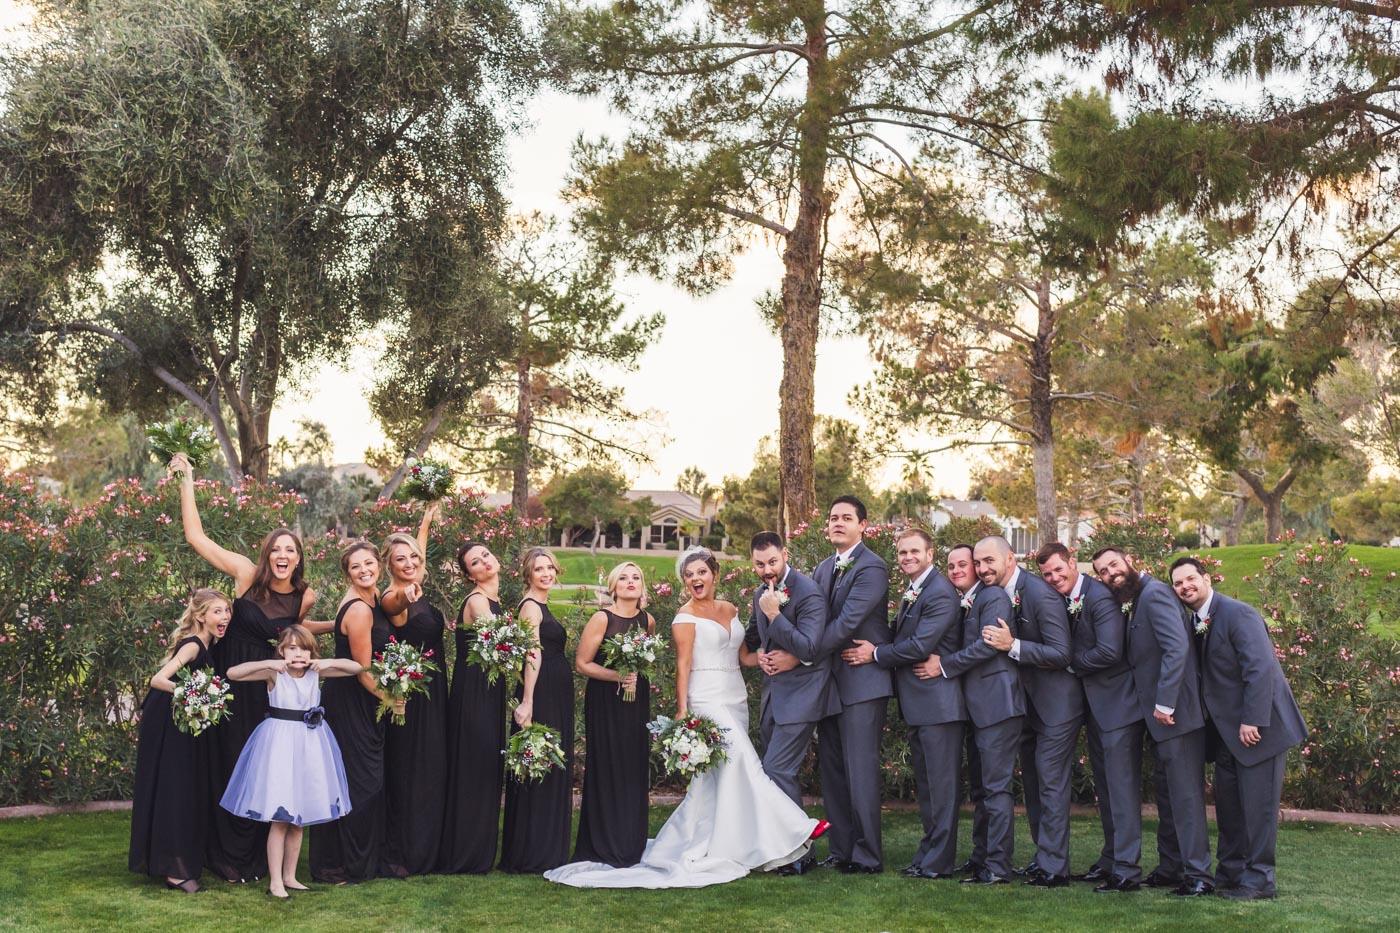 wedding-party-having-fun-portrait